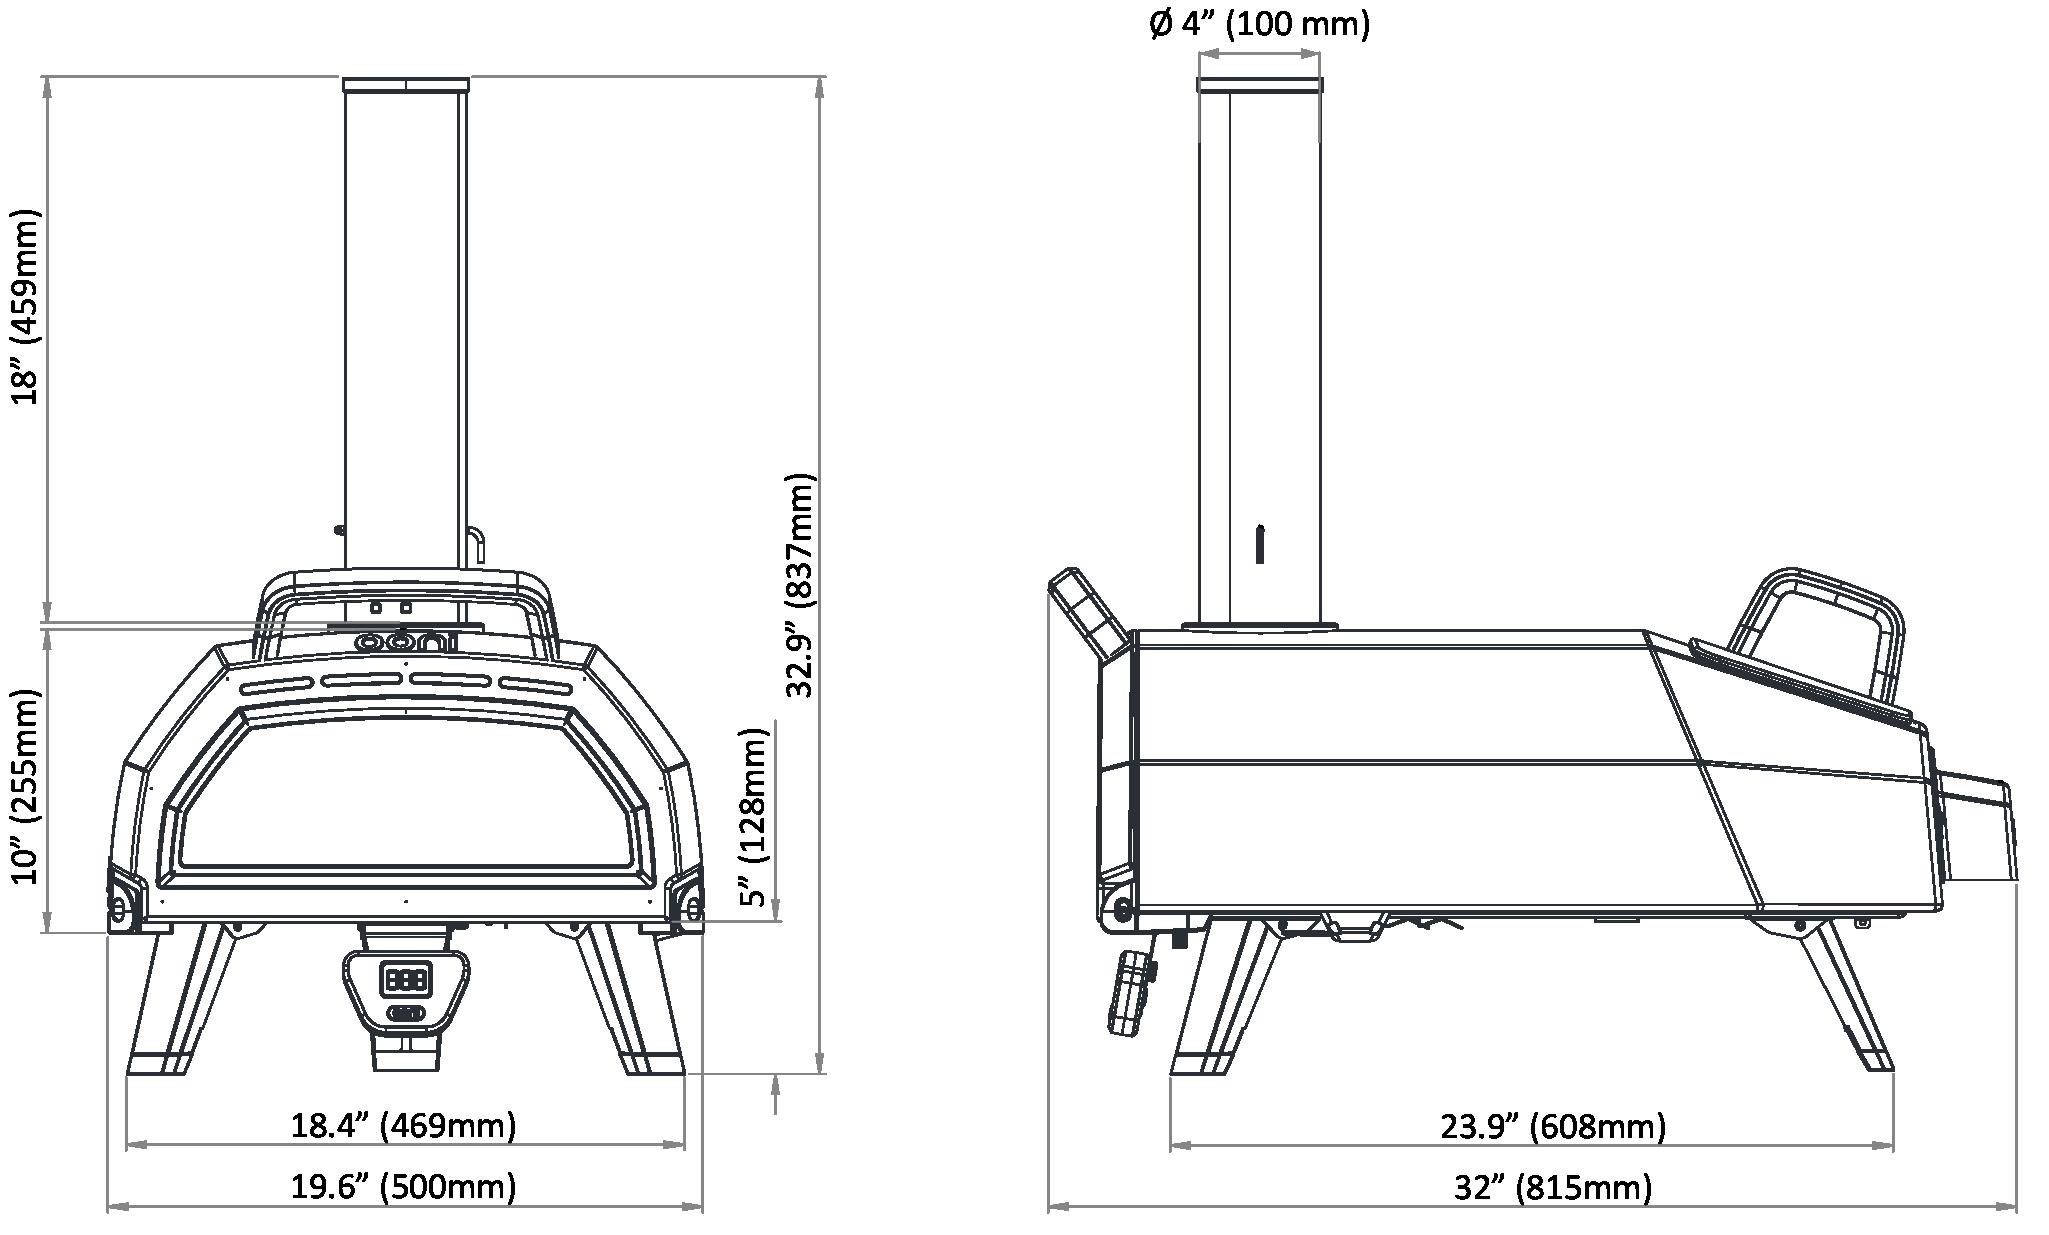 Karu 16 Multi-Fuel Pizza Oven Blueprints